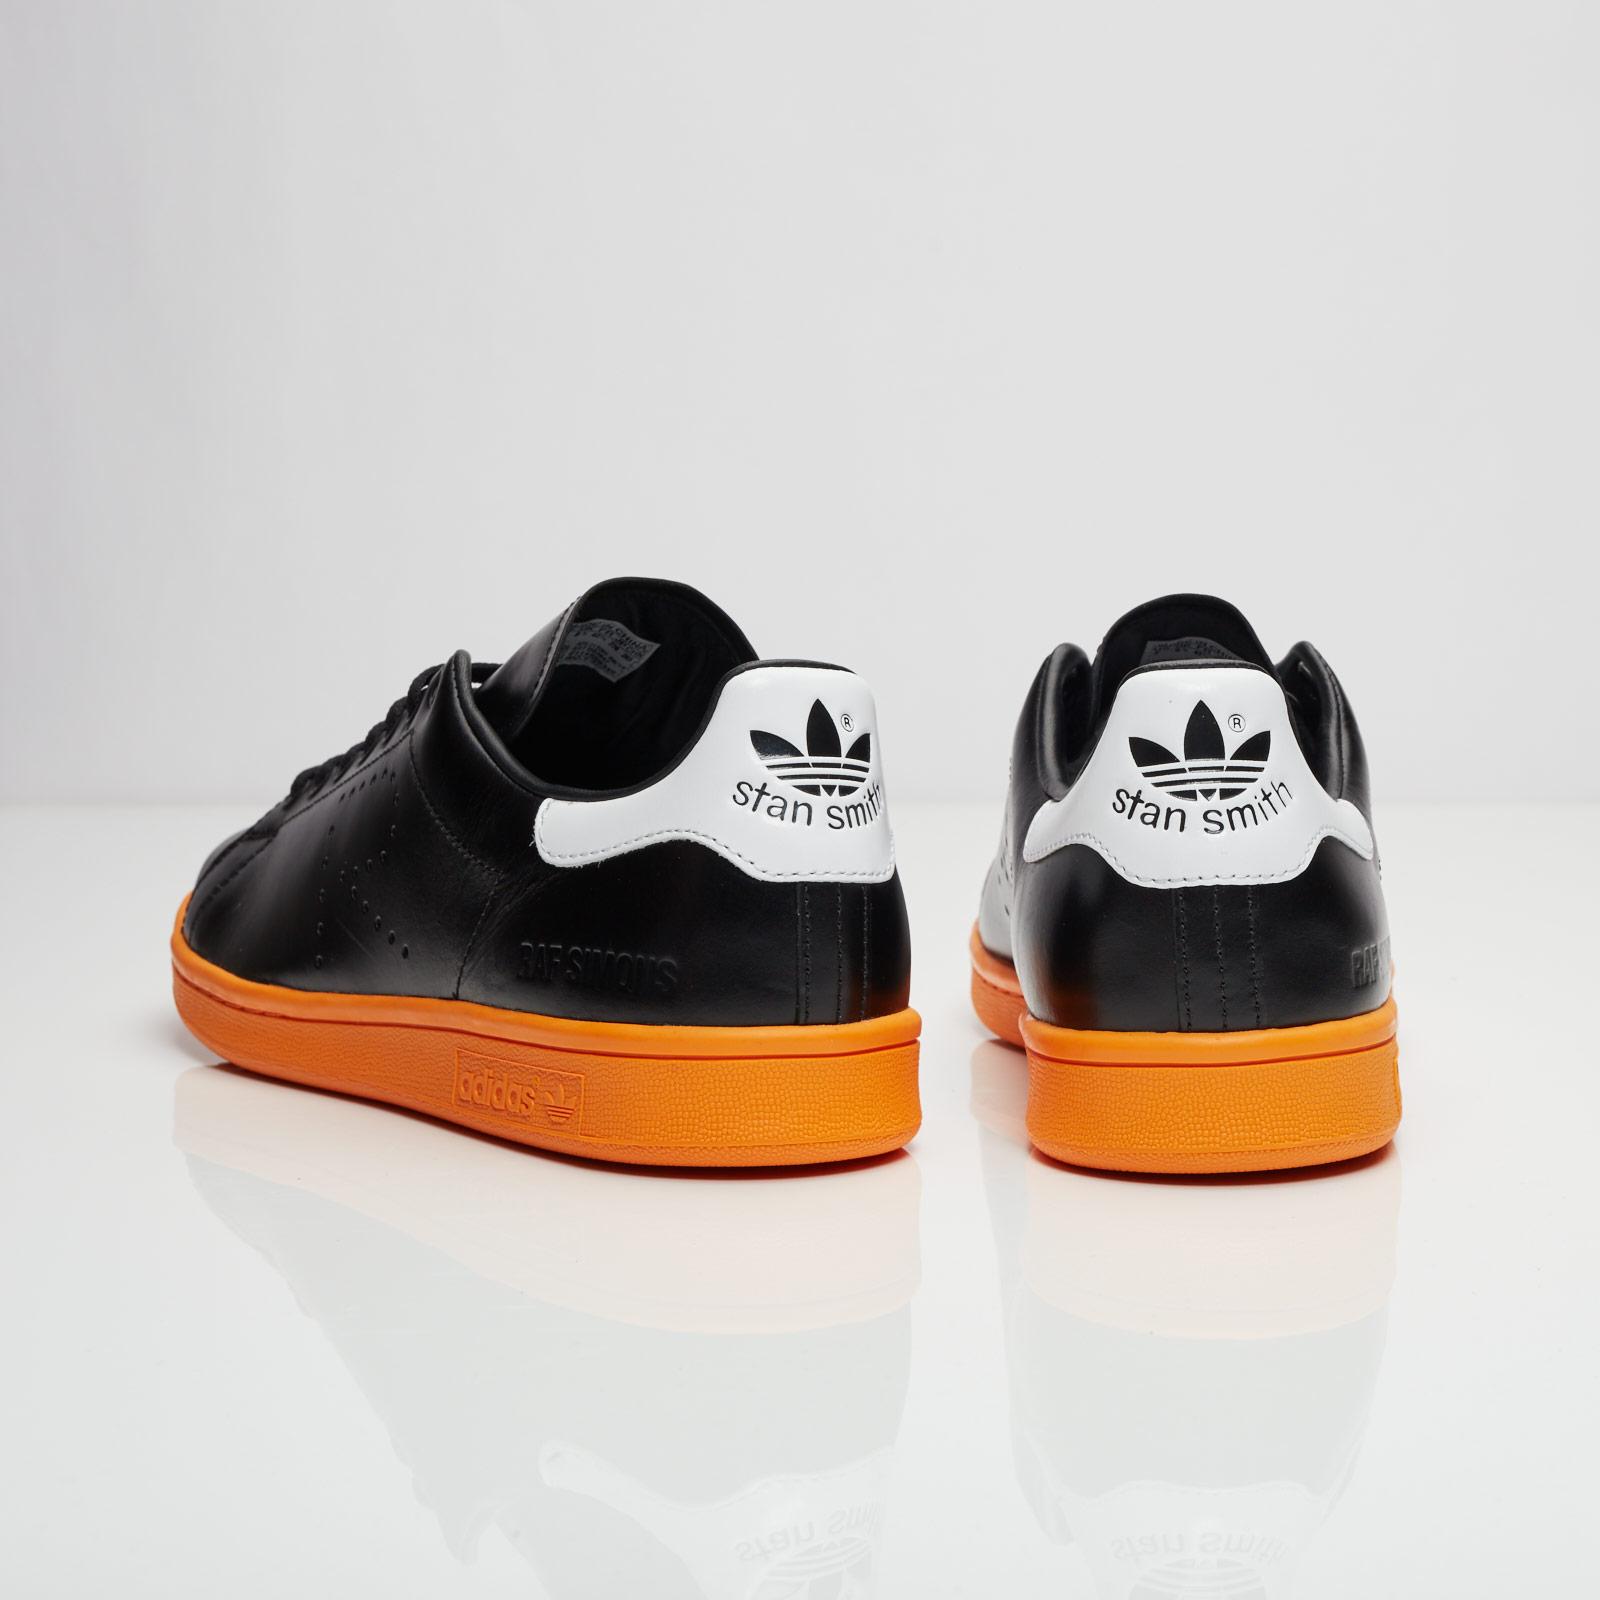 Adidas Stan Smith bb2647 Raf Simons sneakersnstuff Sneakers